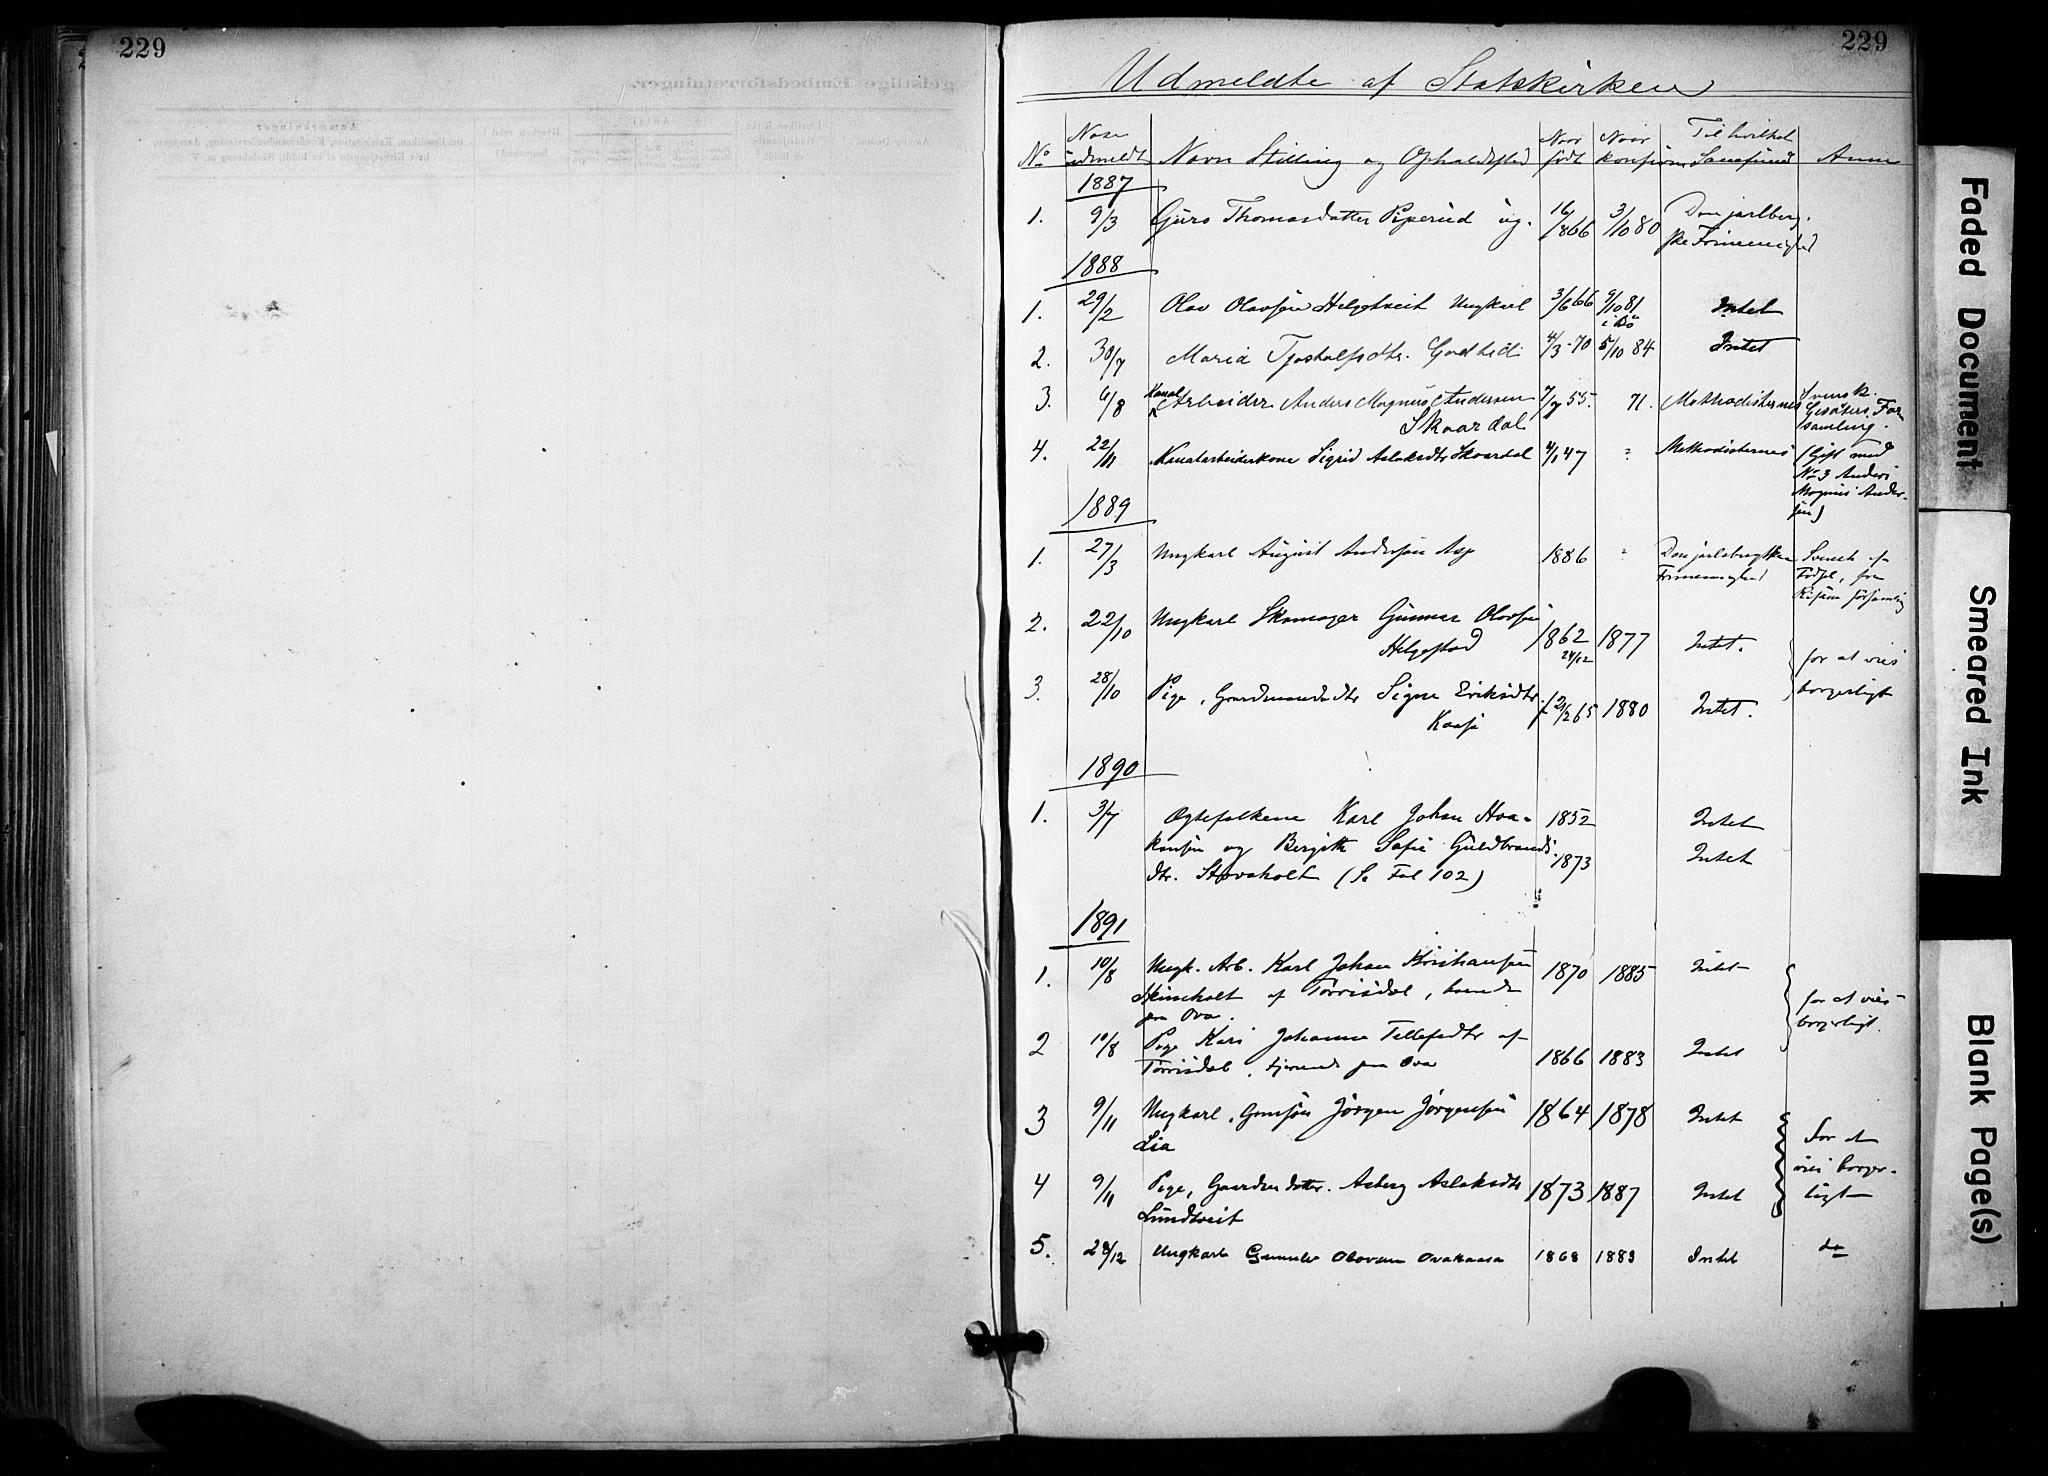 SAKO, Lunde kirkebøker, F/Fa/L0002: Ministerialbok nr. I 2, 1884-1892, s. 229